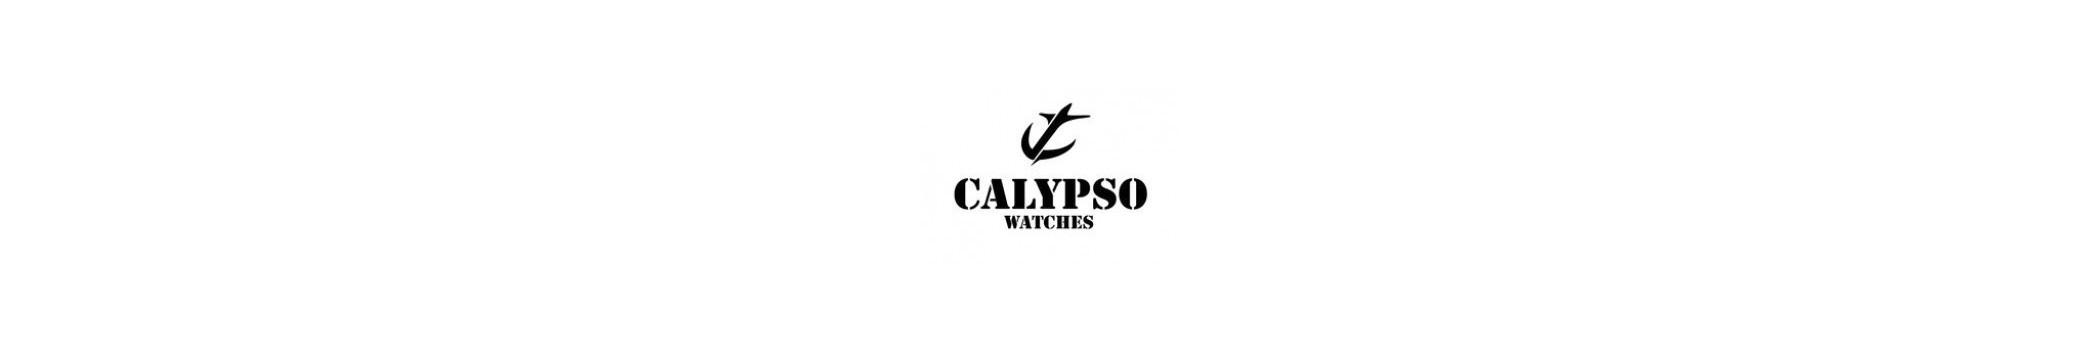 Joieria del mercat | Relojes Calypso